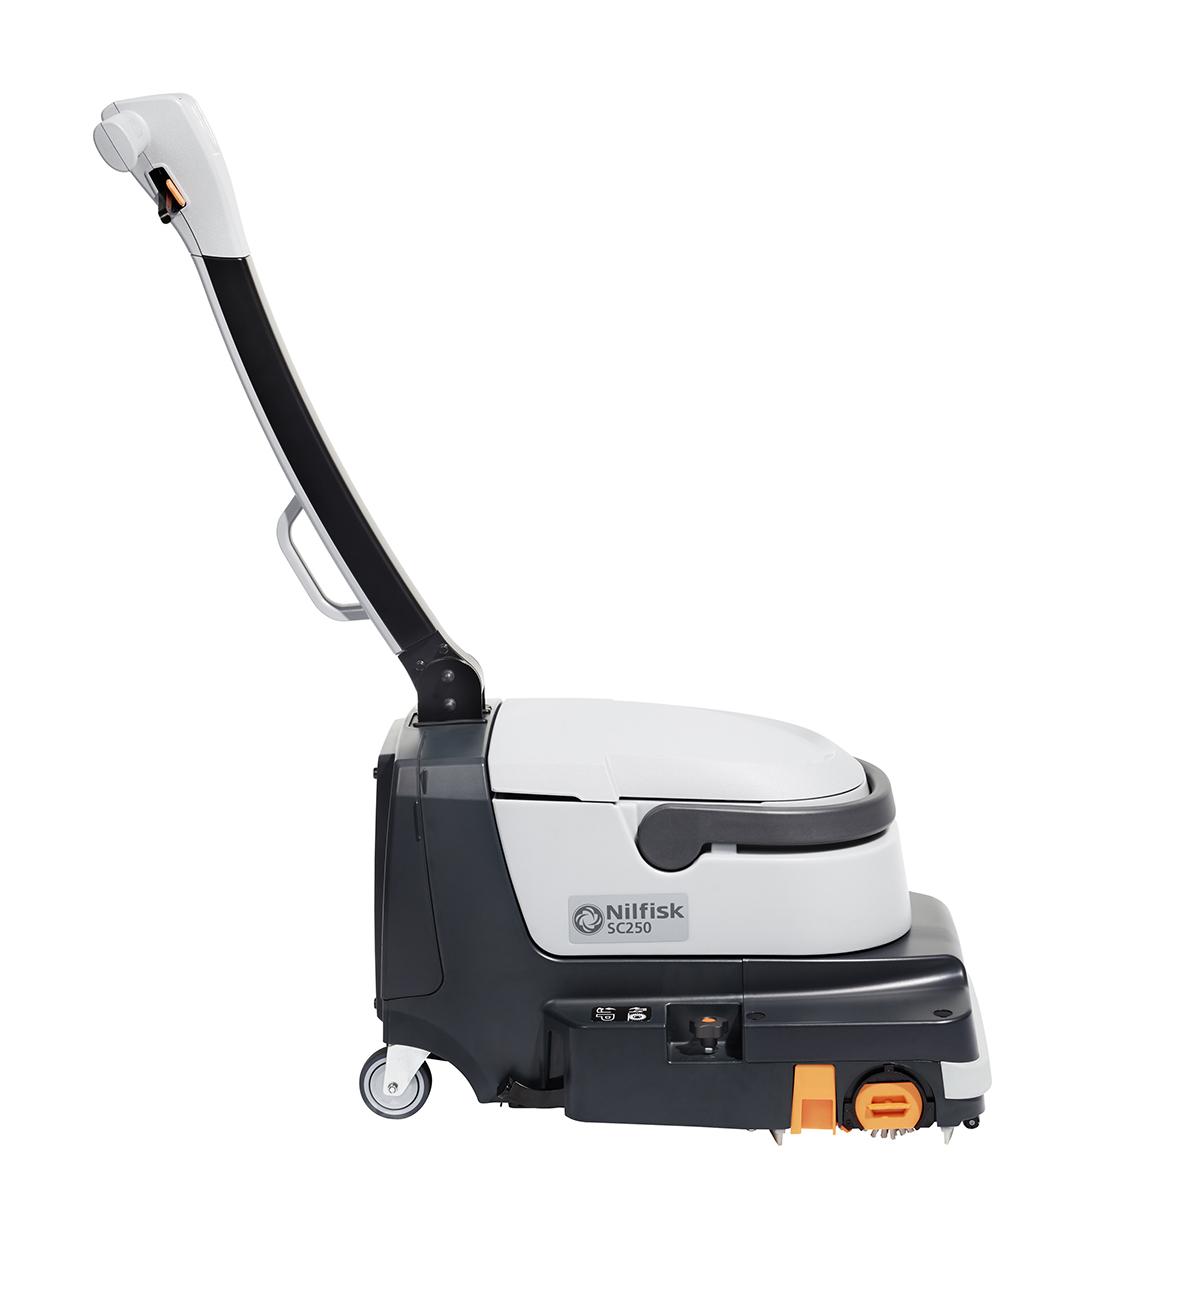 Nilfisk Sc250 Lvc London Vacuum Company